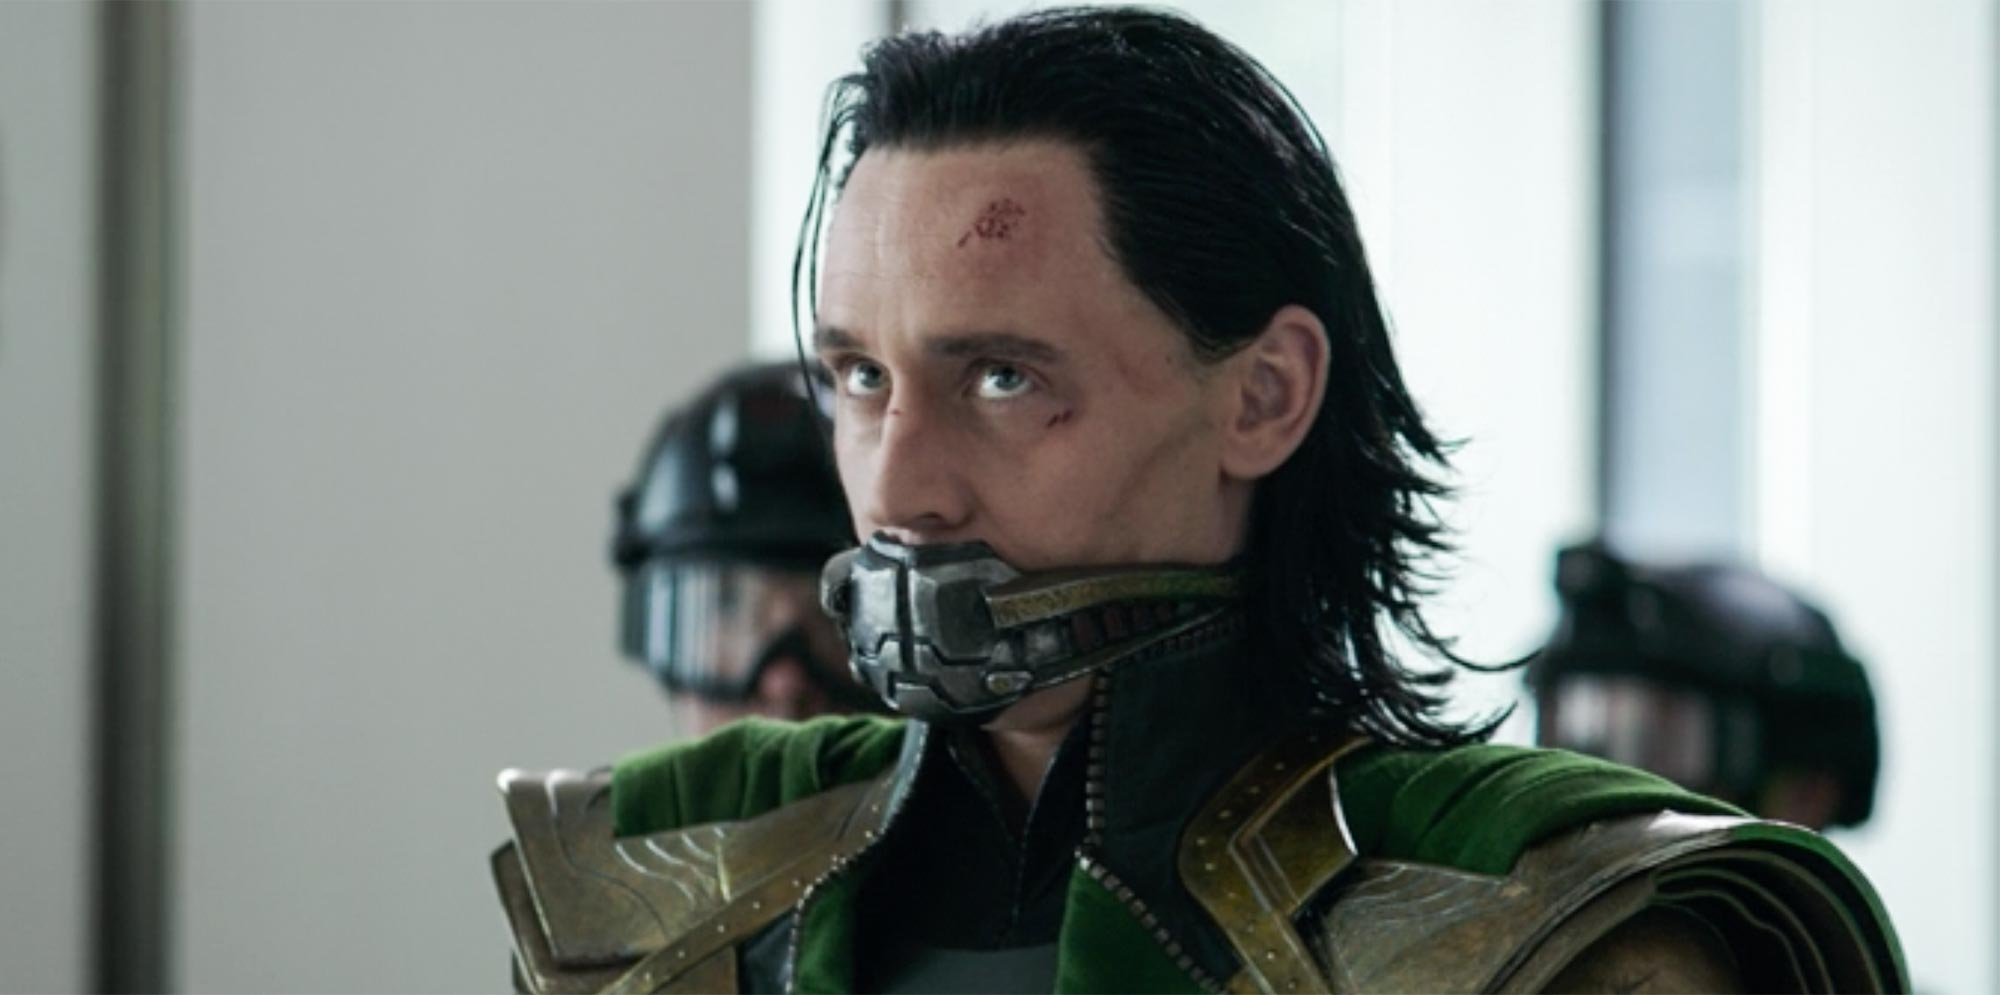 Avengers: Endgame: Tom Hiddleston as Loki